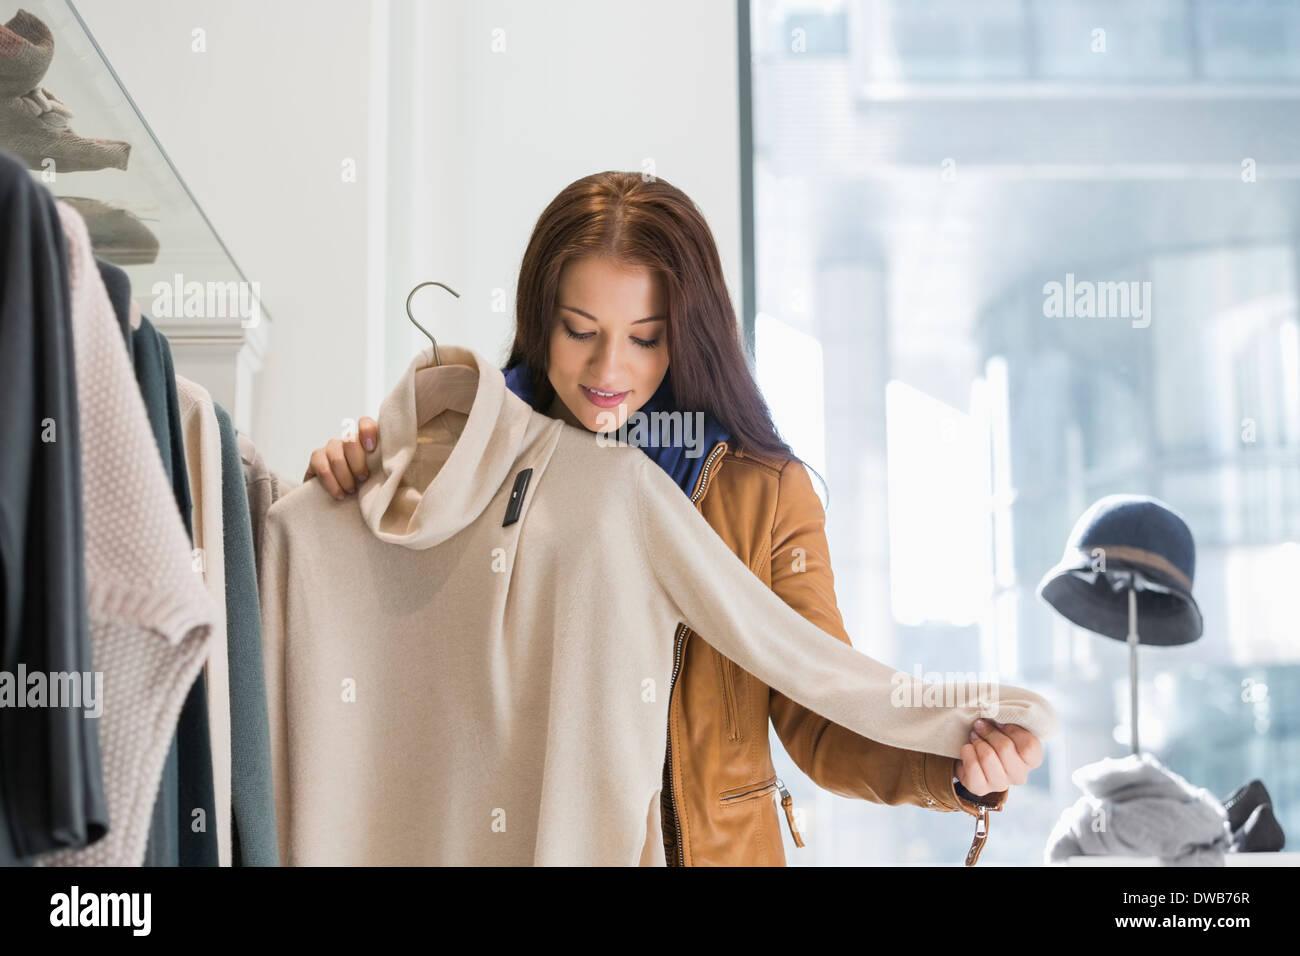 Mujer joven elegir suéter en la tienda Imagen De Stock